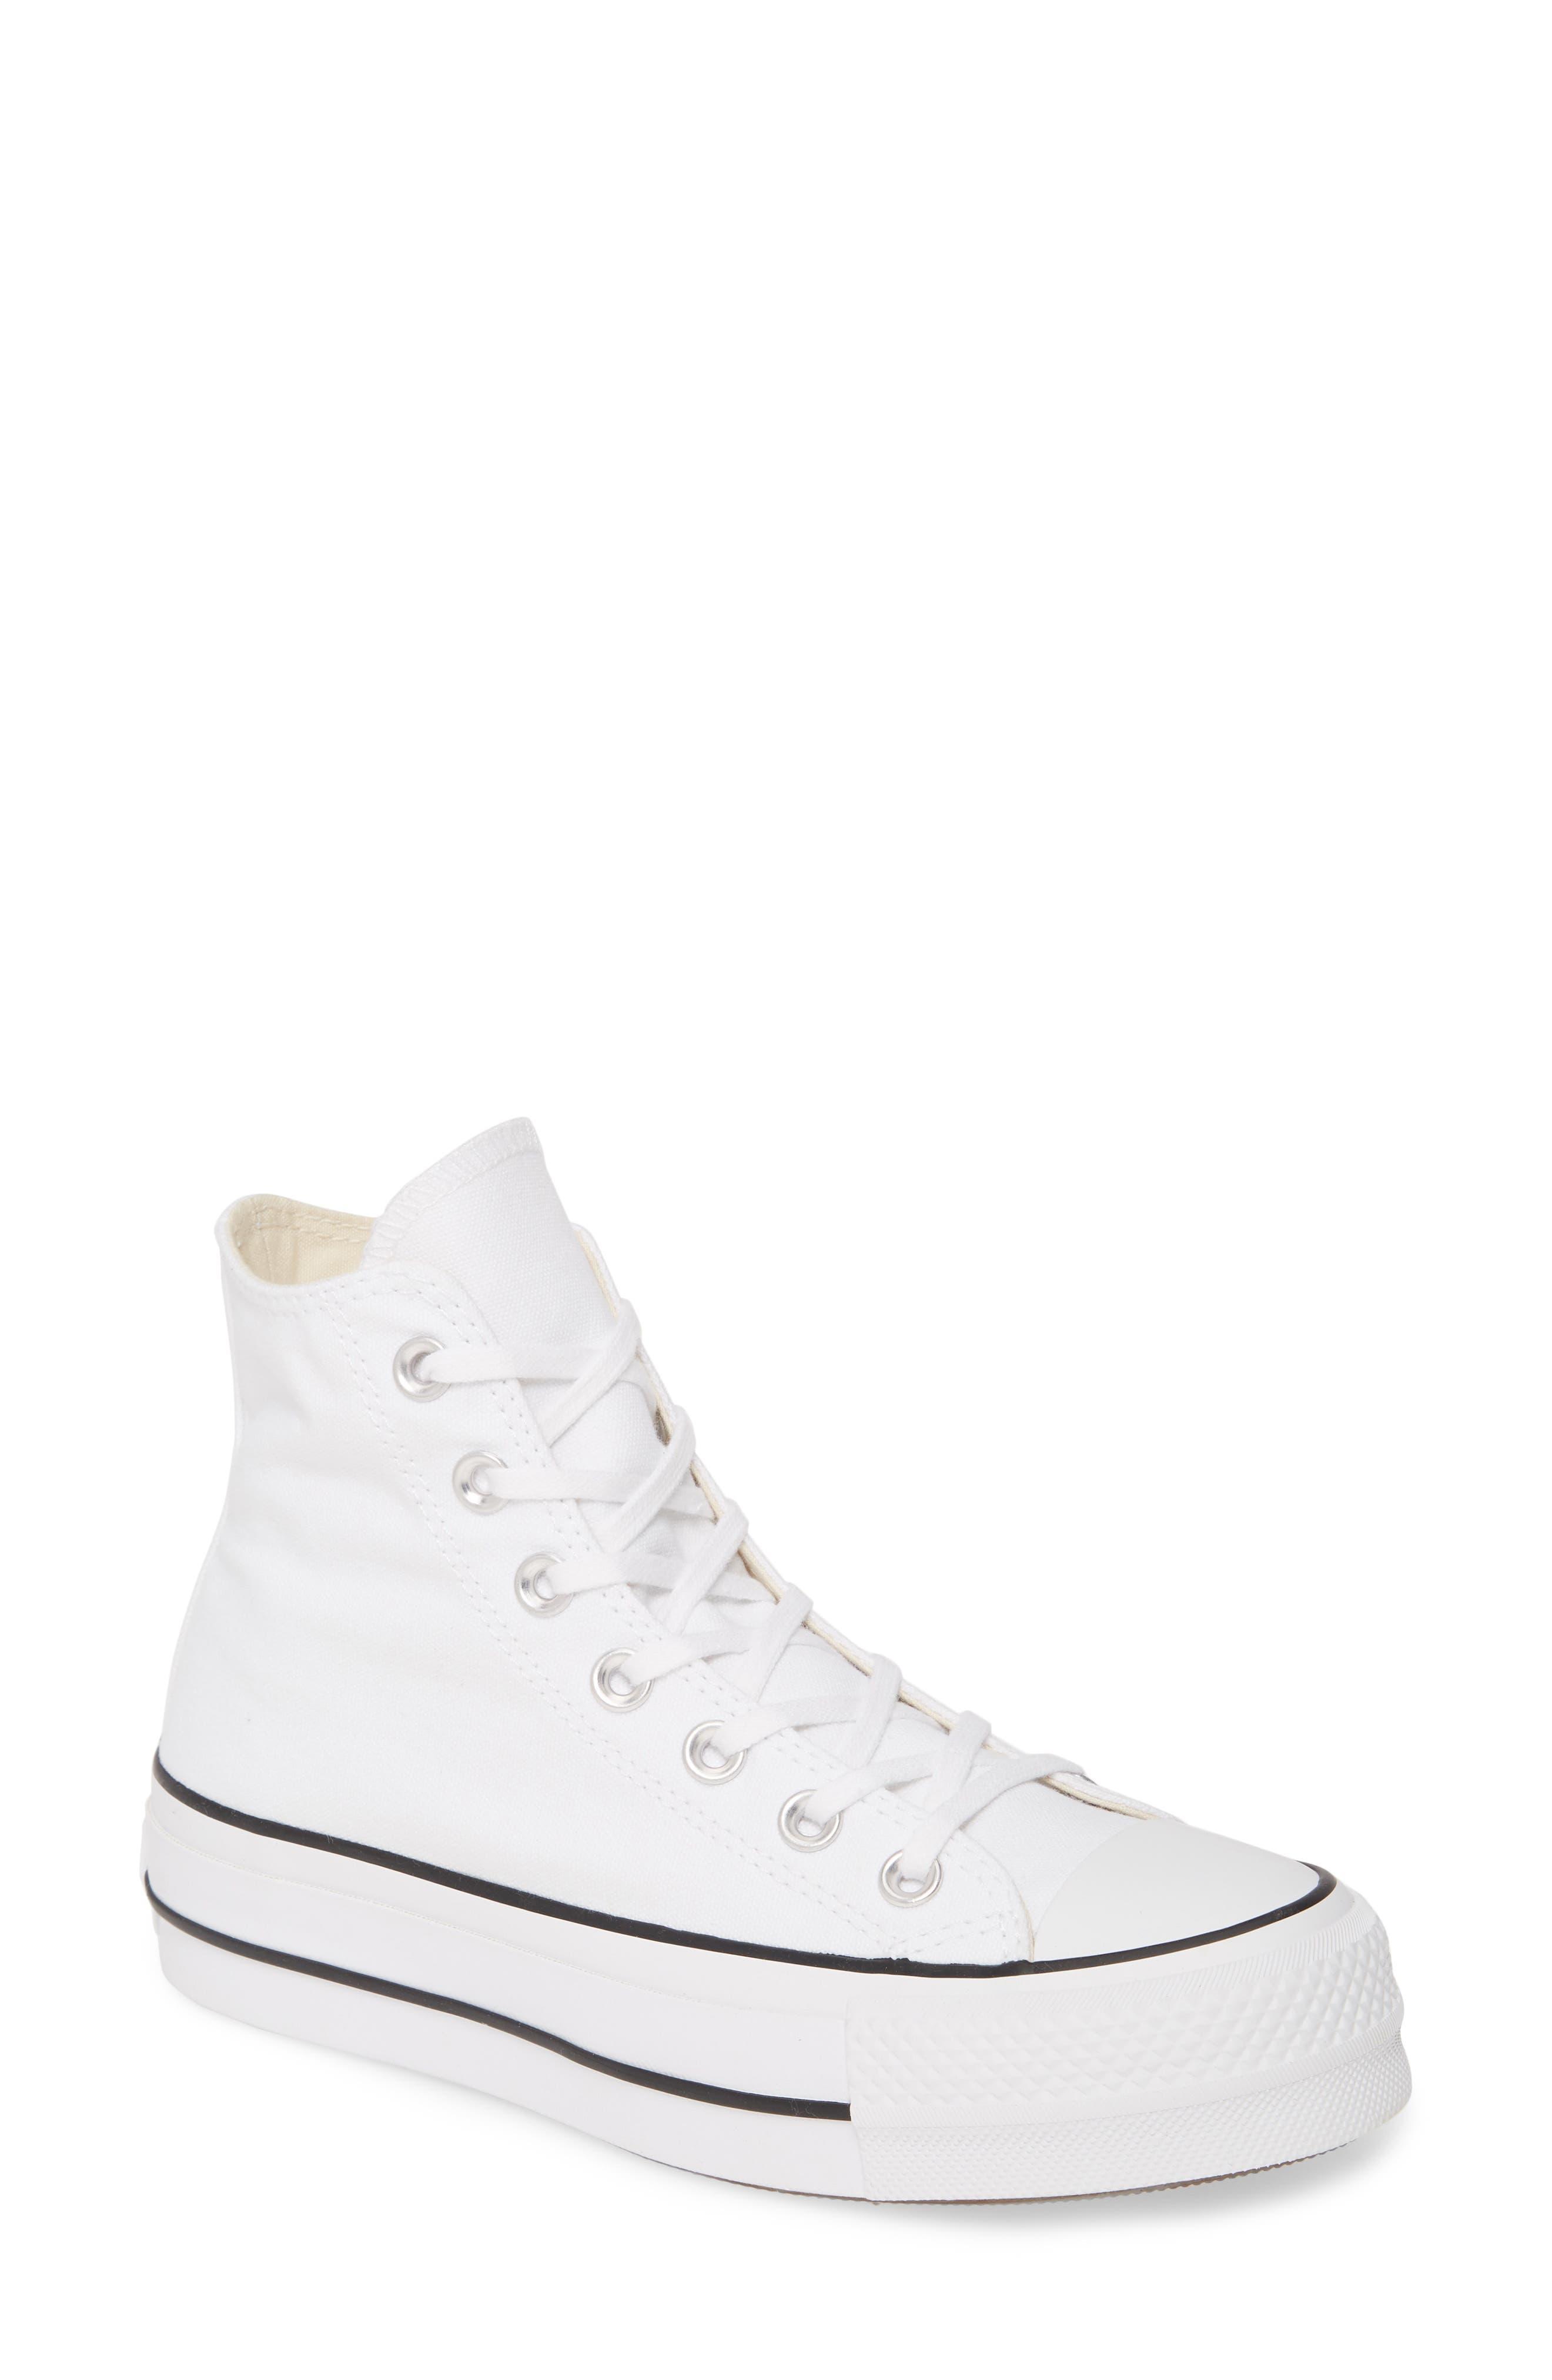 Converse Chuck Taylor All Star Lift High Top Platform Sneaker, White